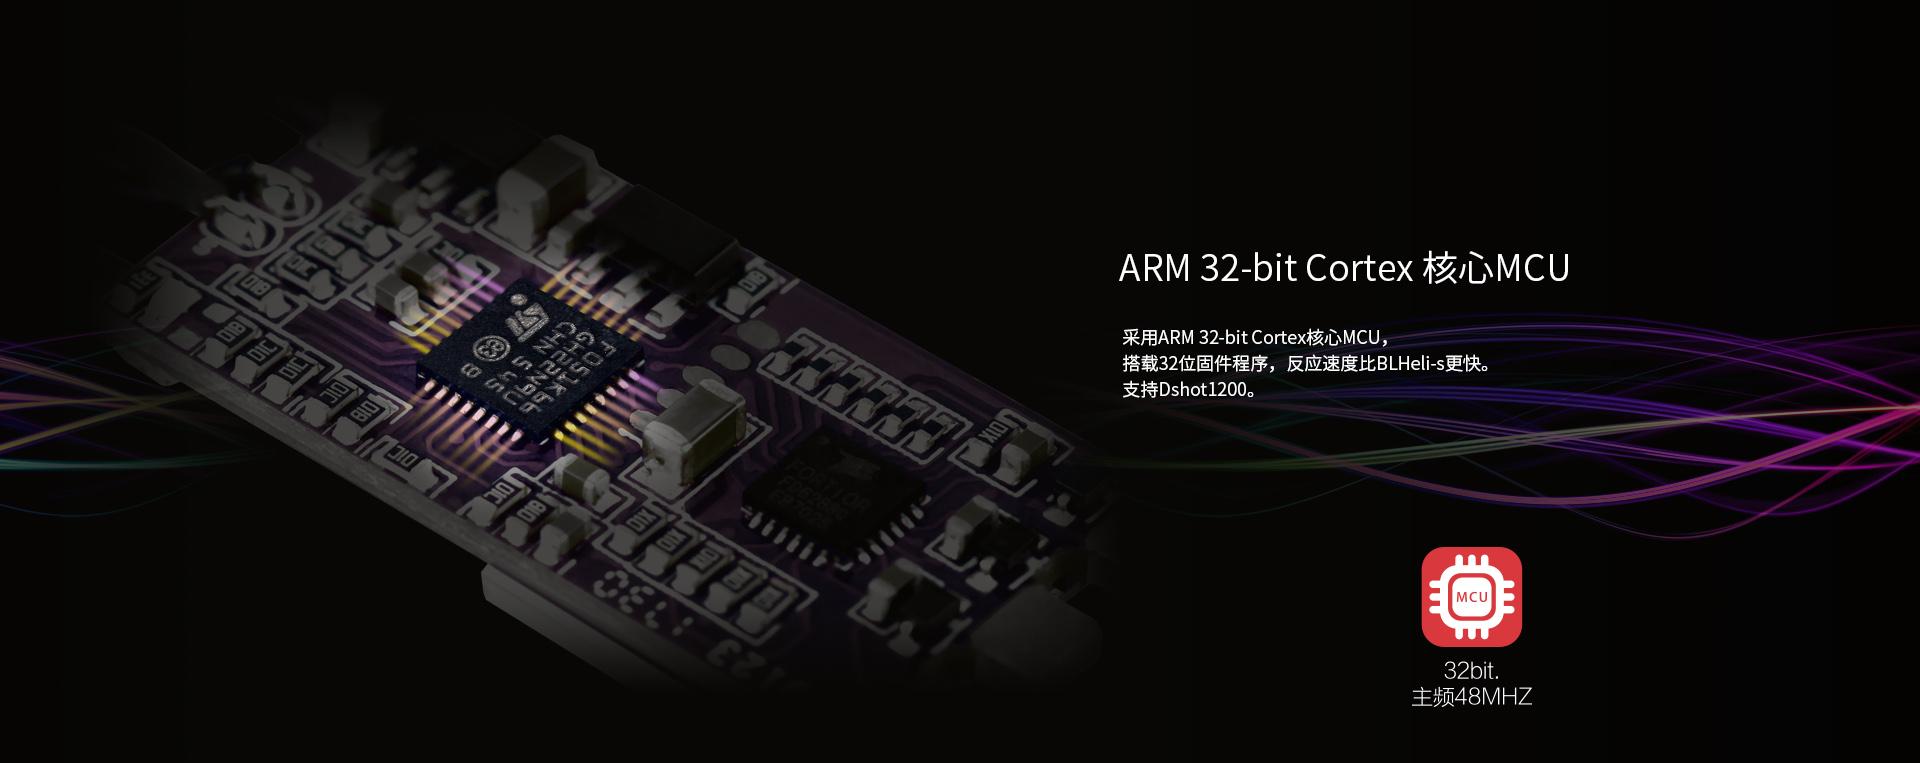 img-1-强劲MCU.jpg